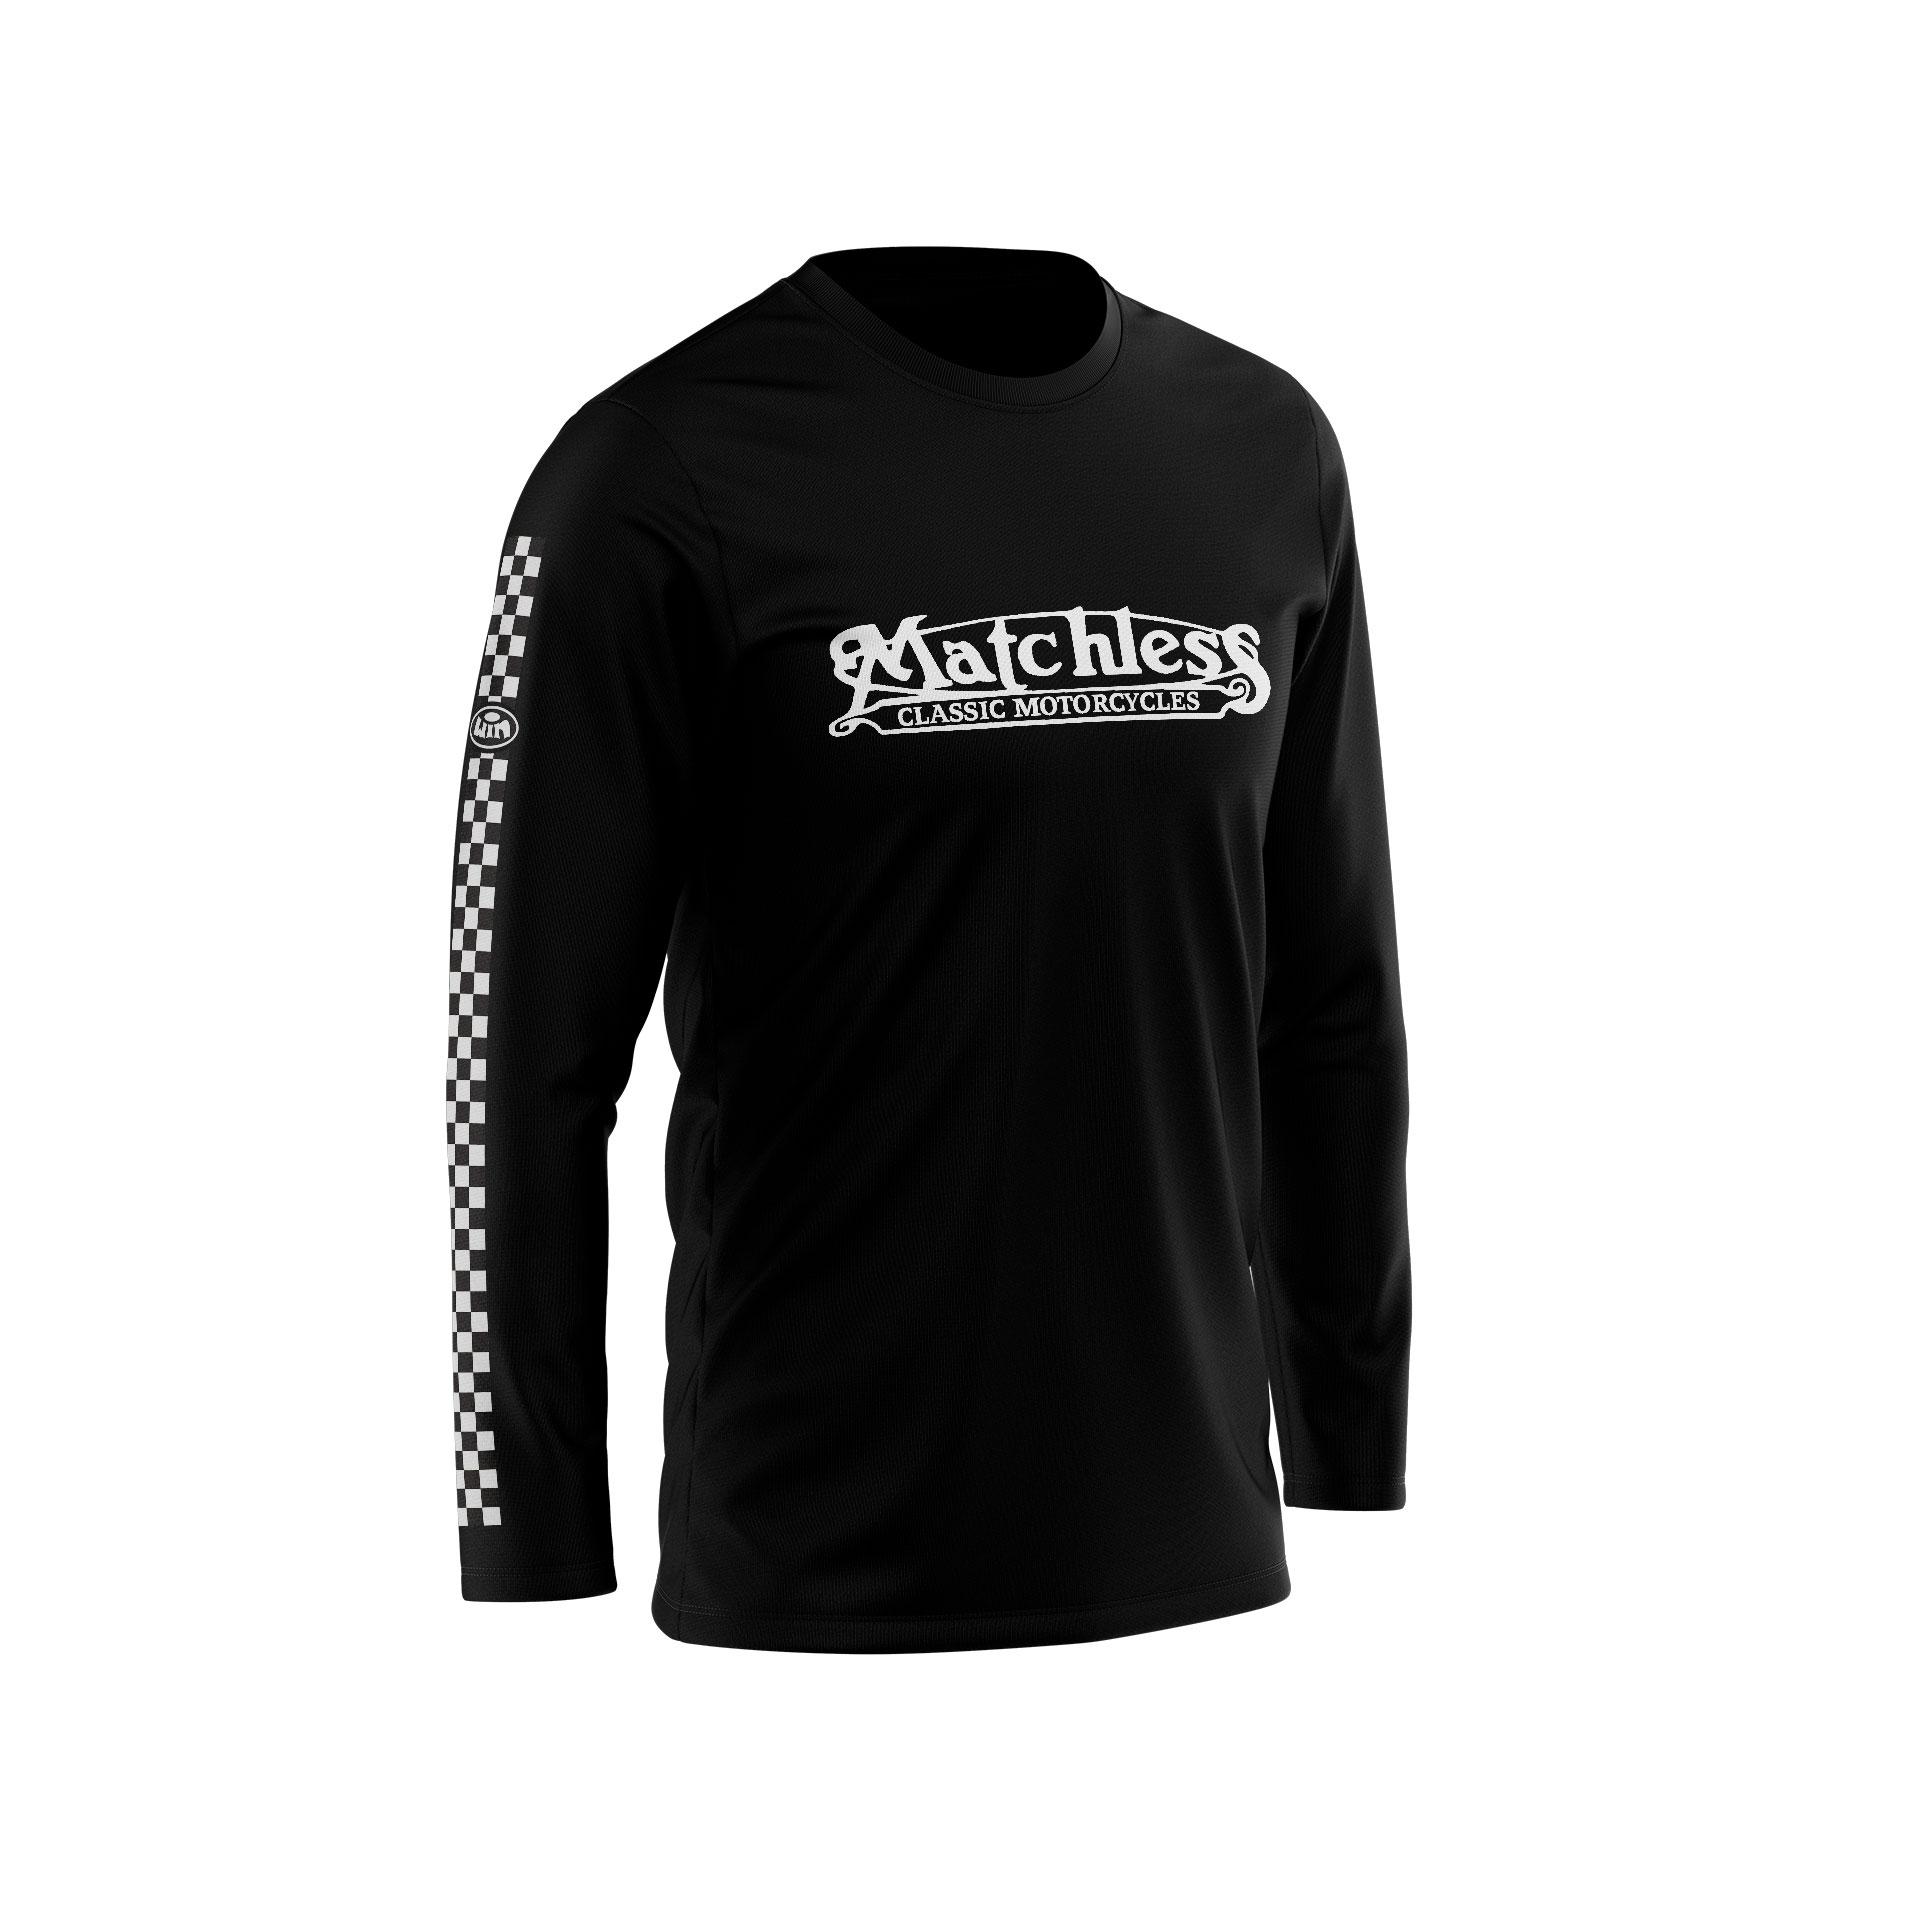 TSLS MATCHLESS Noir - Blanc